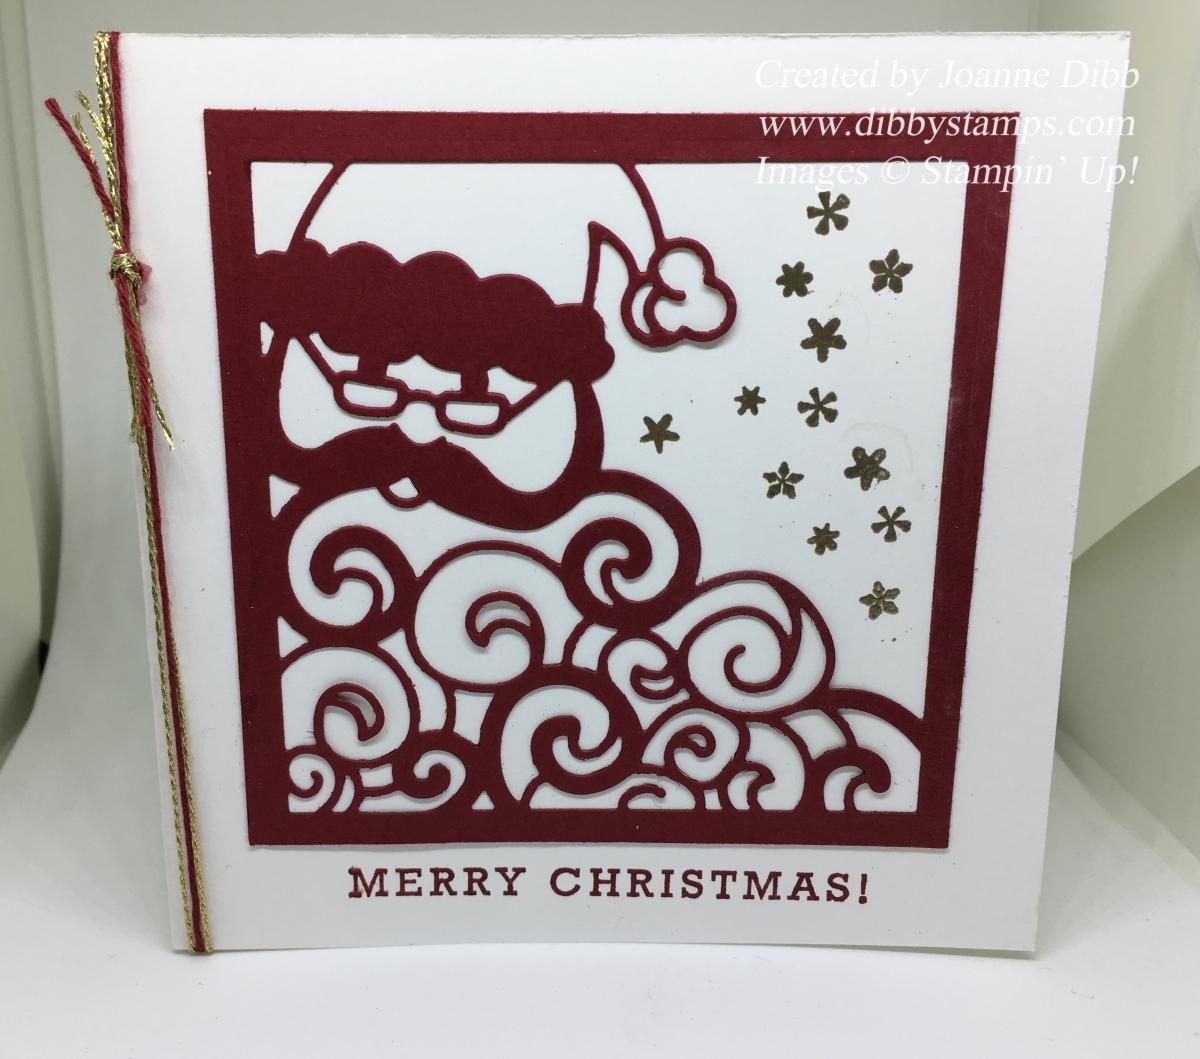 Cherry Cobbler Detailed SantaCard